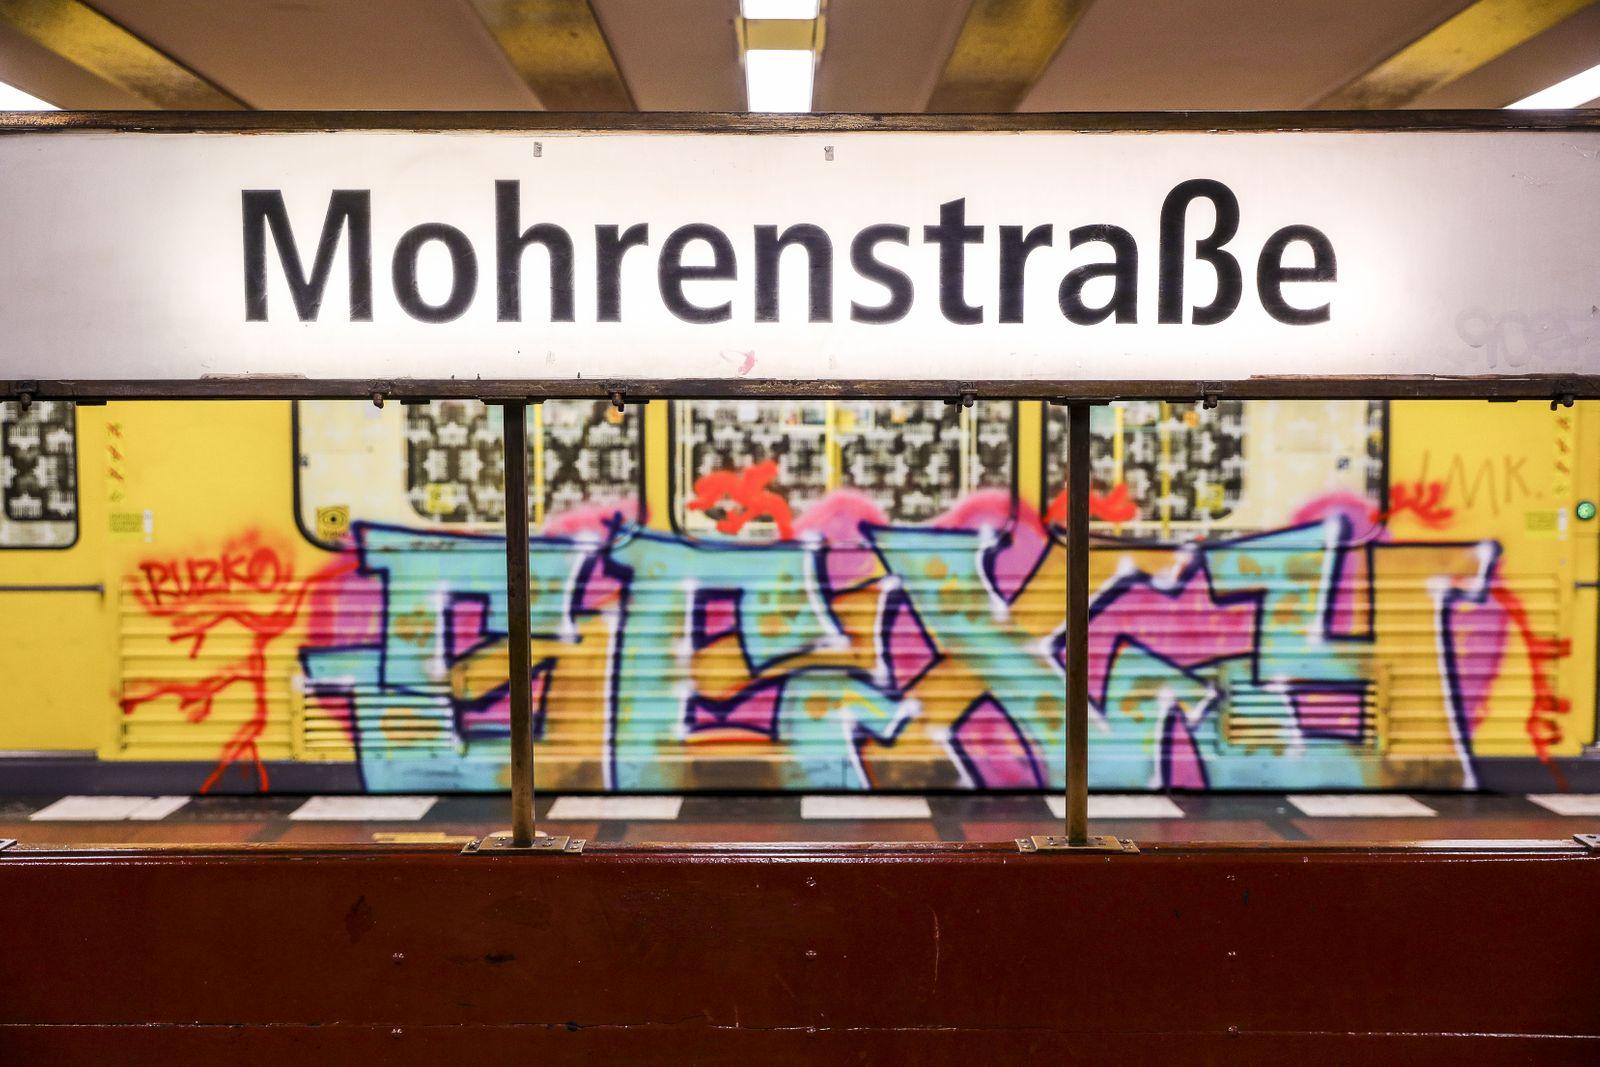 Mohrenstrasse metro station to be renamed, Berlin, Germany - 05 Jul 2020